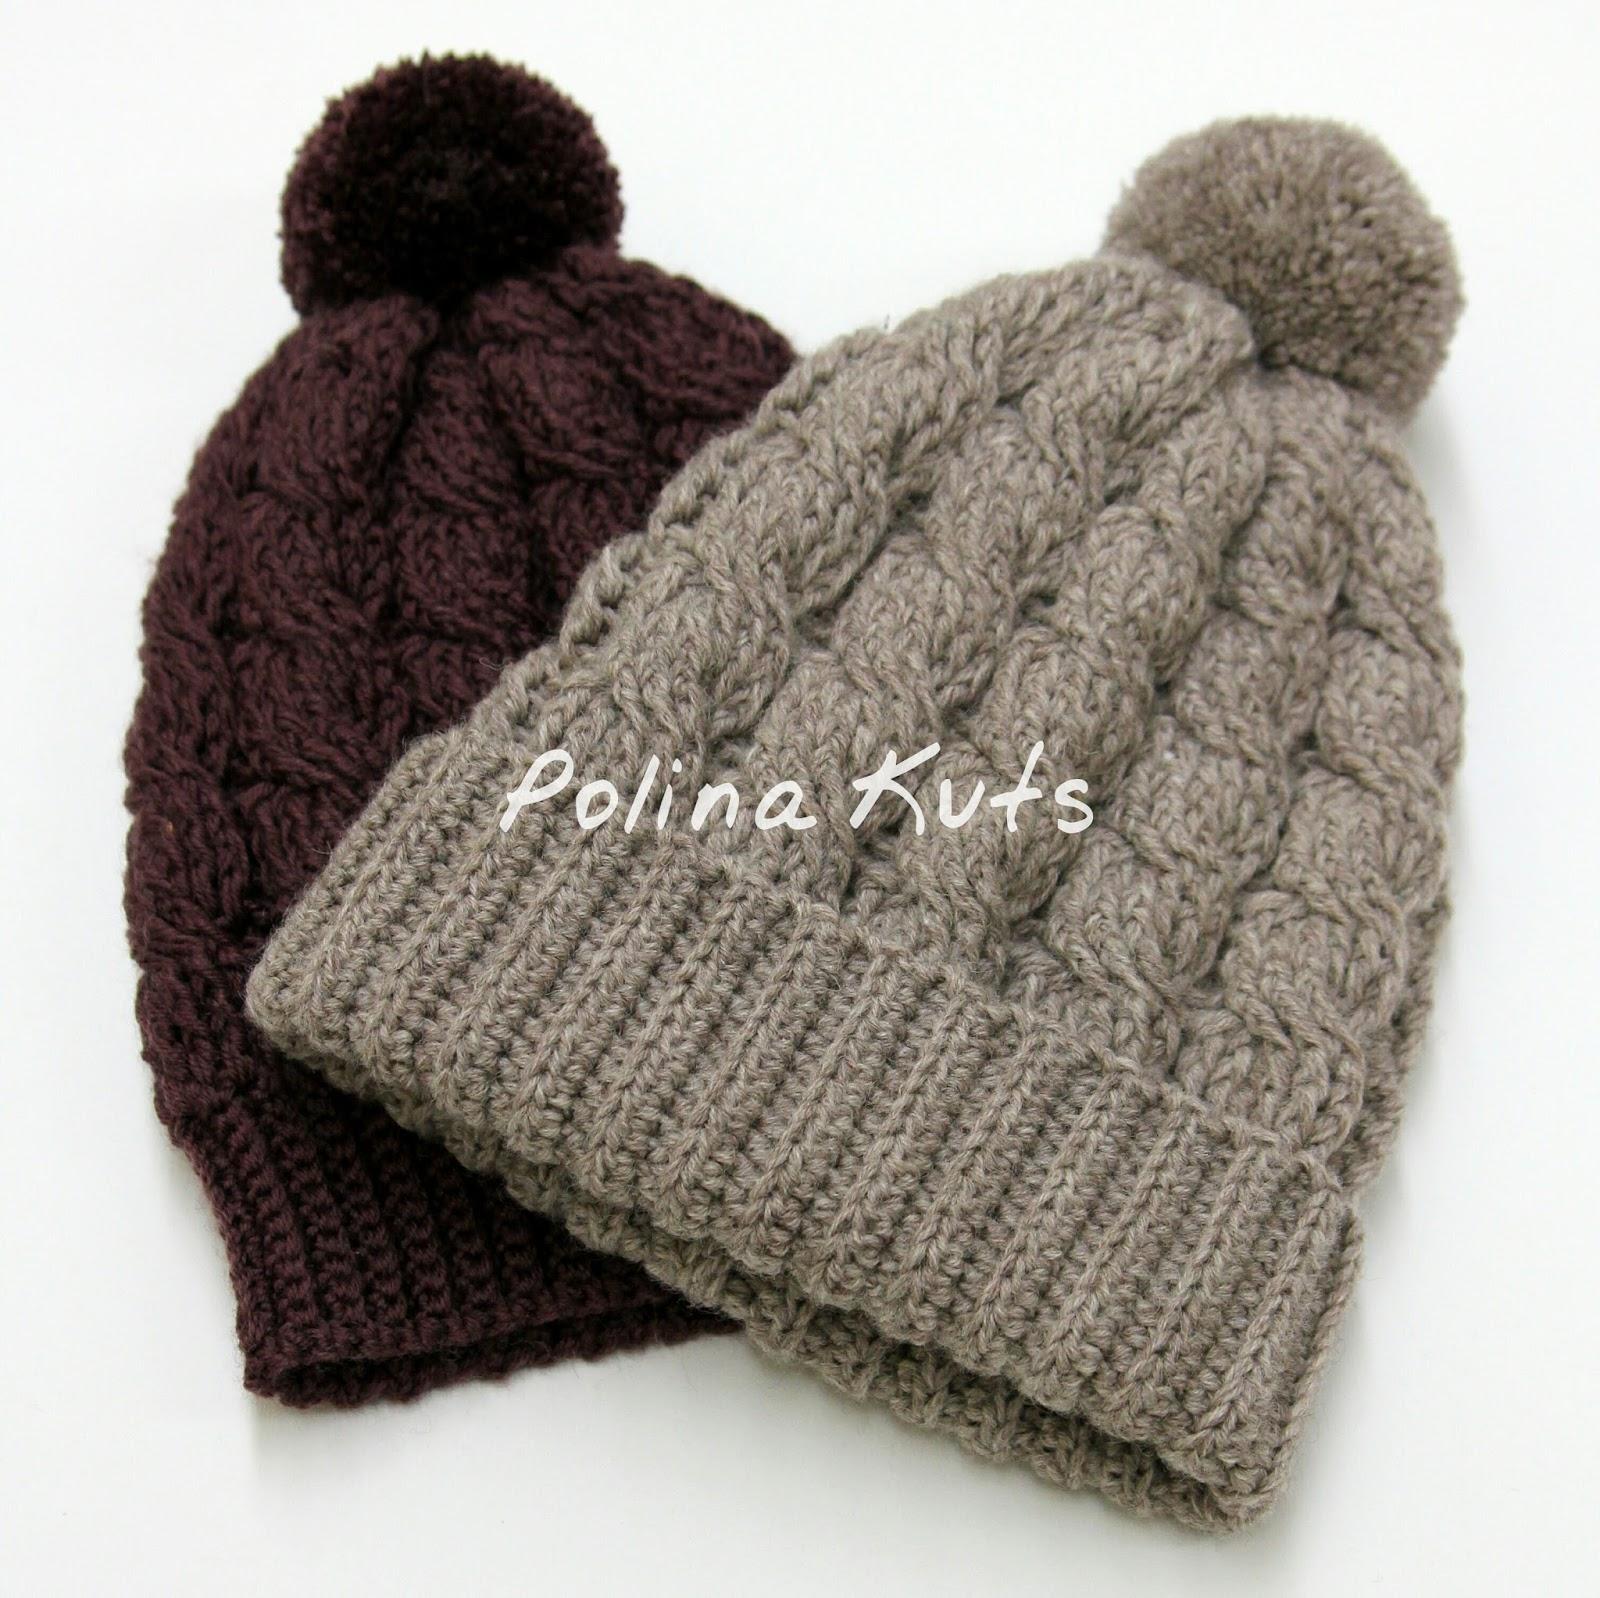 Polina Kuts косы крючком шапка крючком косы виды резинки крючком